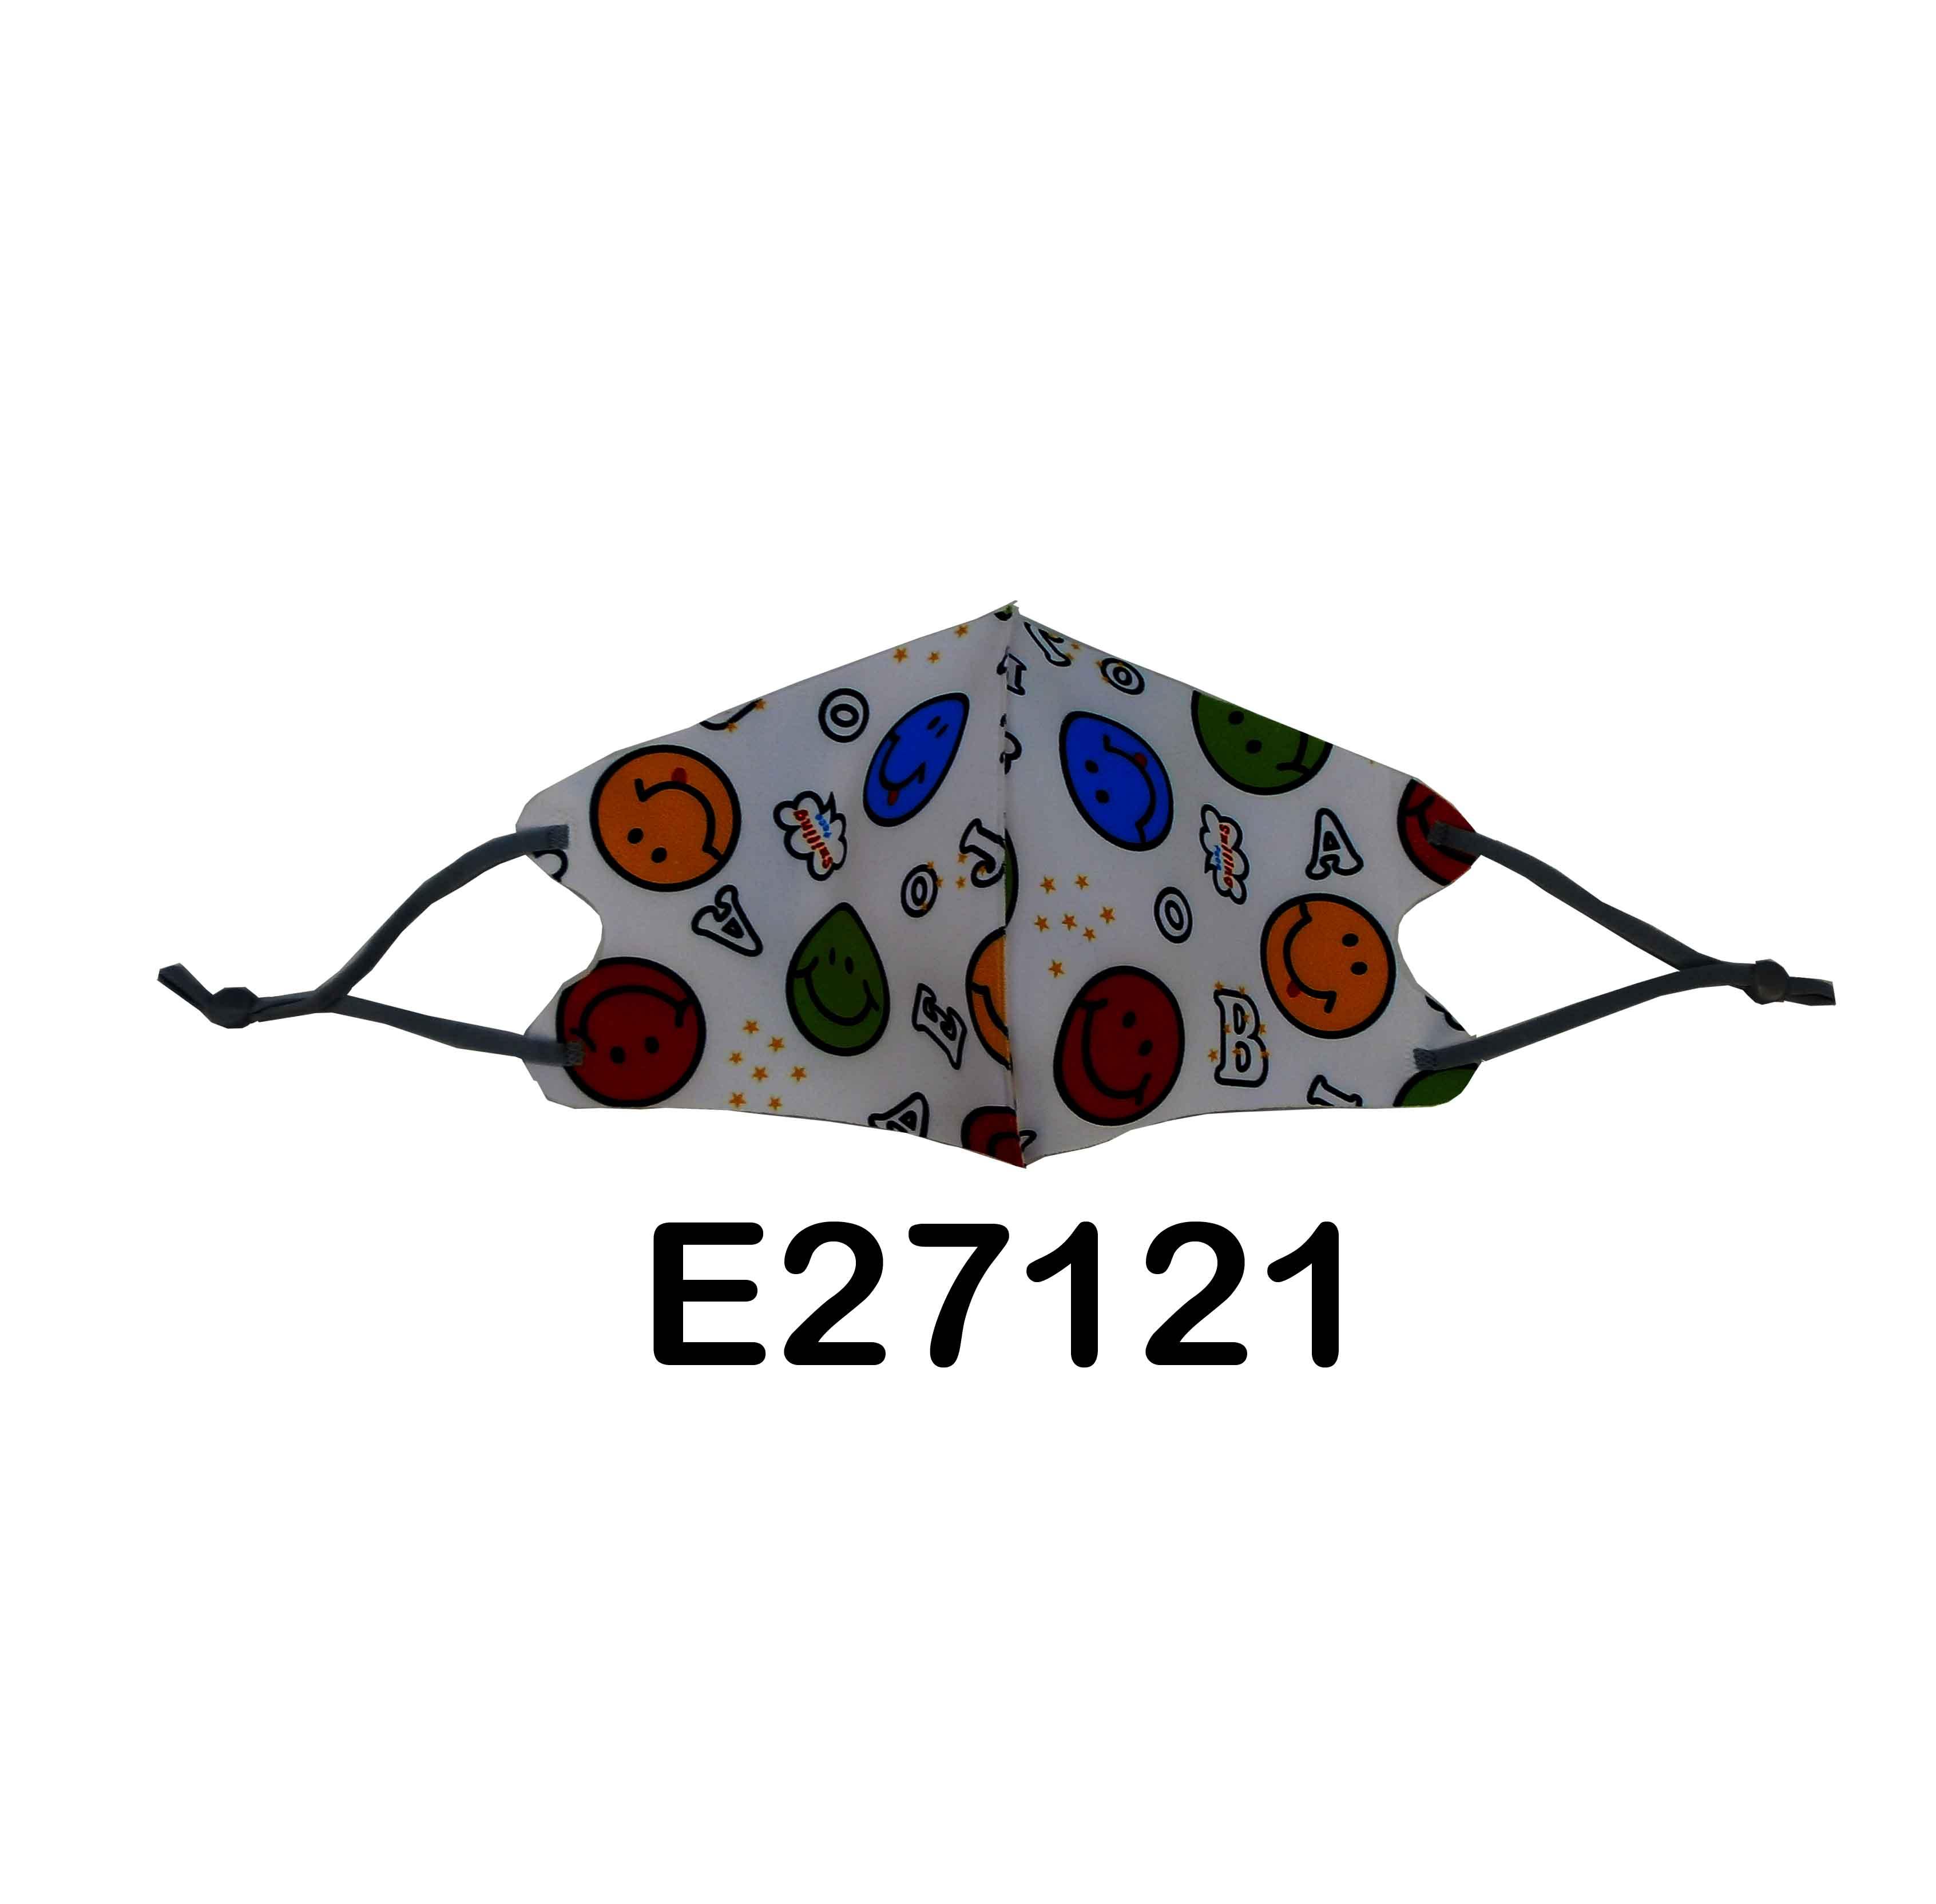 E27121